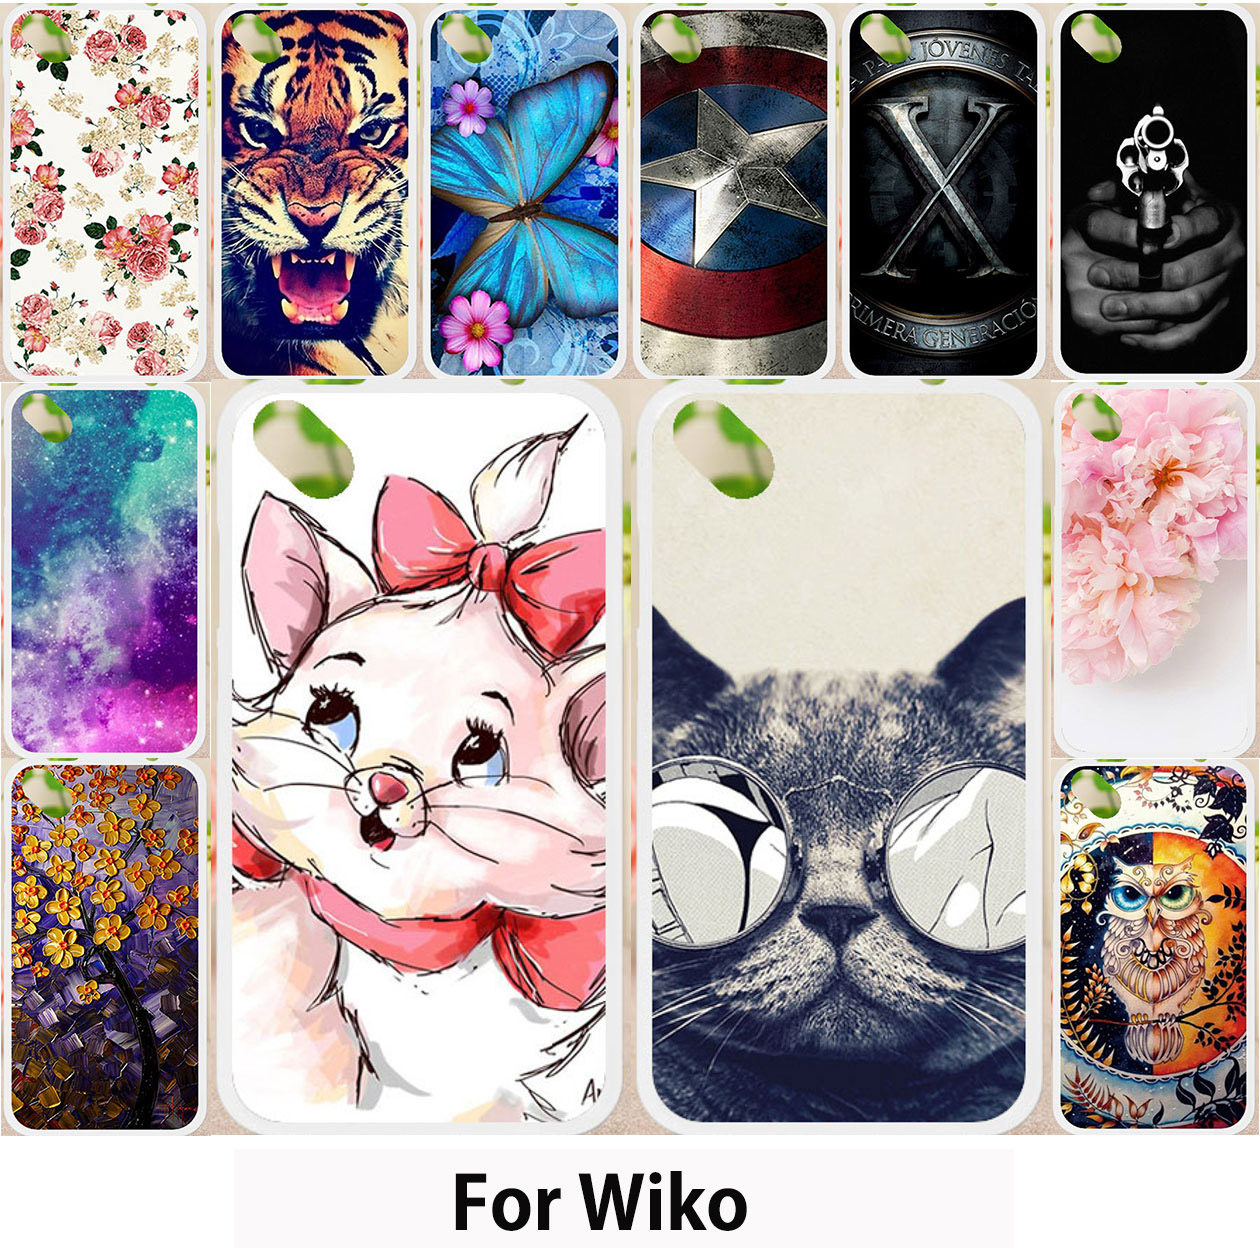 Walcox Cases For Wiko Sunny 2 Plus MAX Case Wiko Lenny 3 4 MAX Plus Jerry 2 Harry Freddy Kenny Rainbow Jam 3G Ridge 4G S-Kool